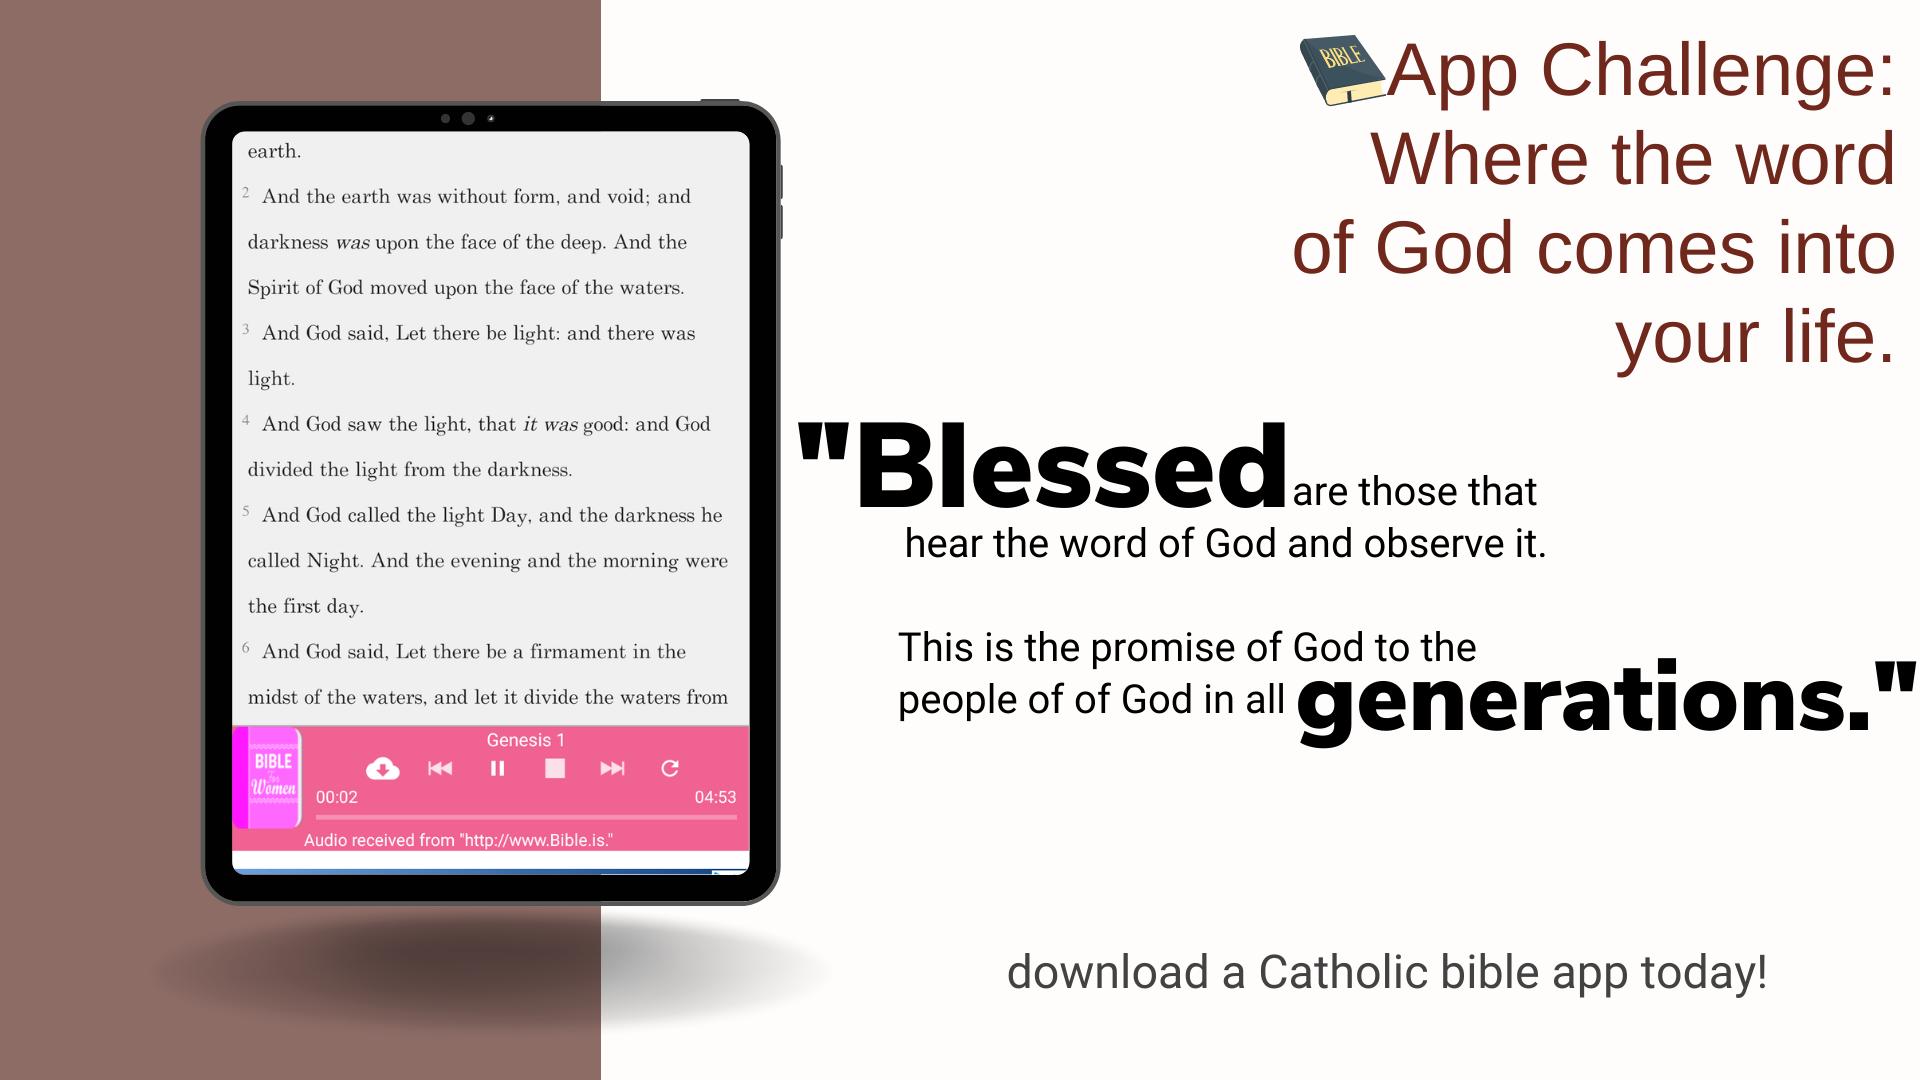 Fr Scott's App challenge